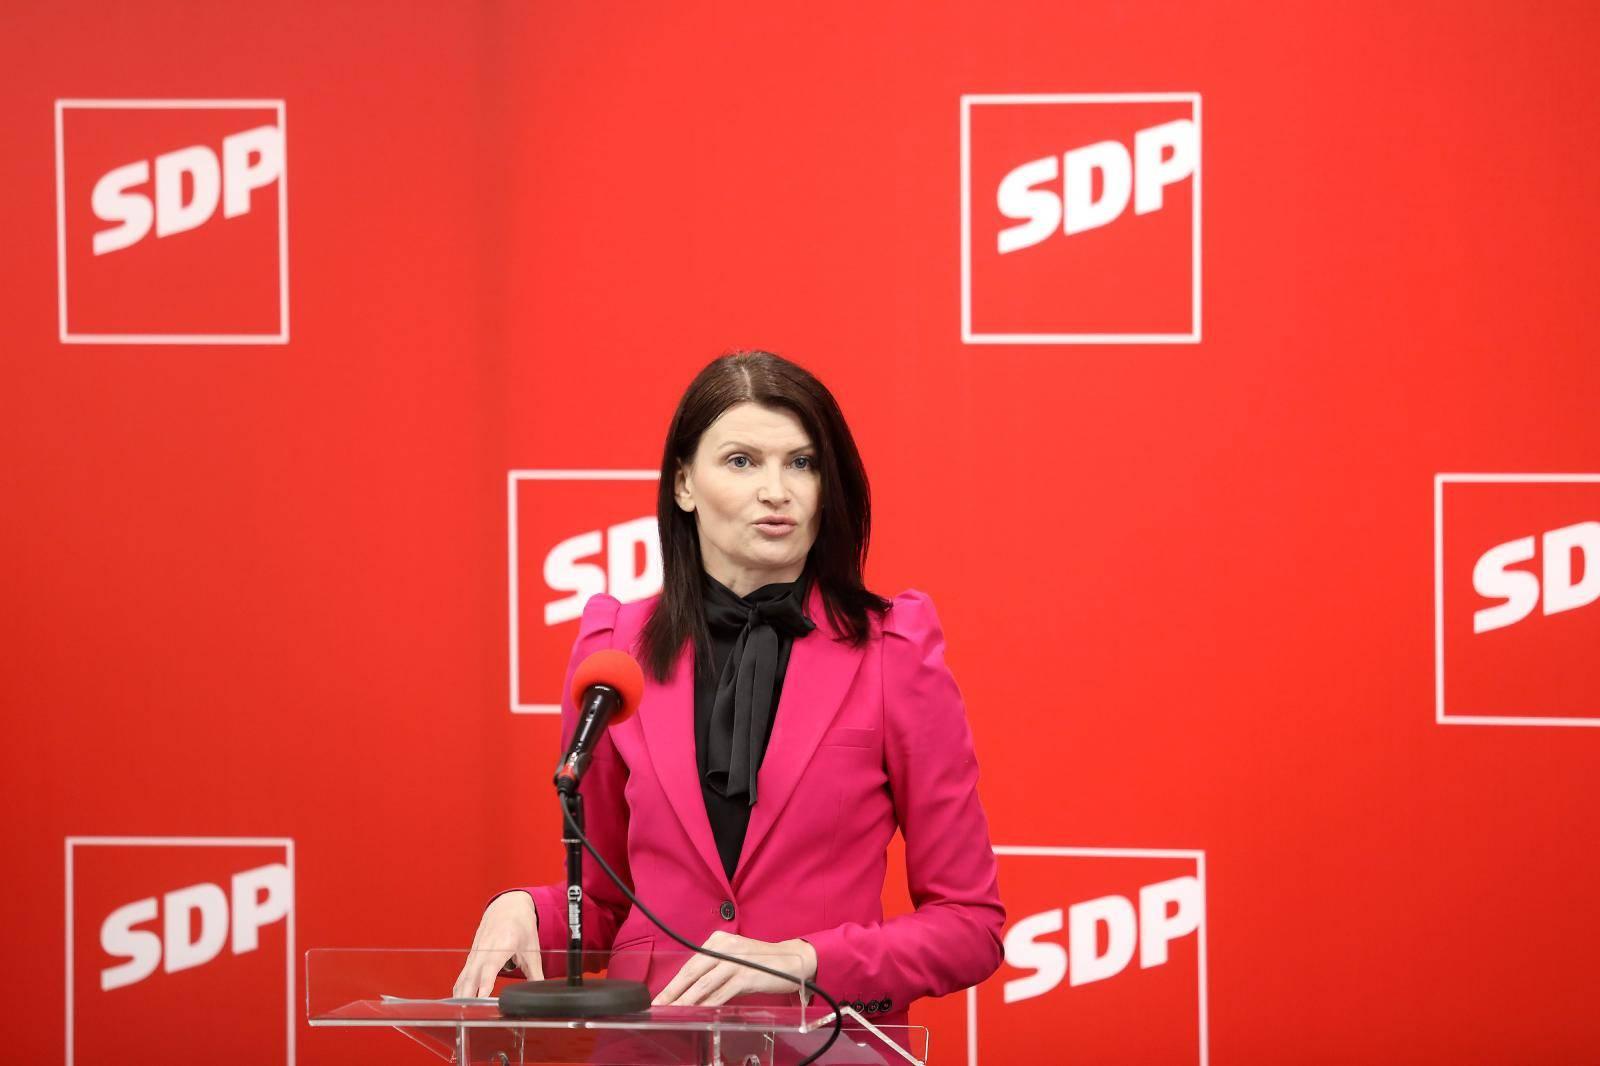 Zagreb: Konferencija za medije SDP-a o totalnom kaosu u obrazovanju